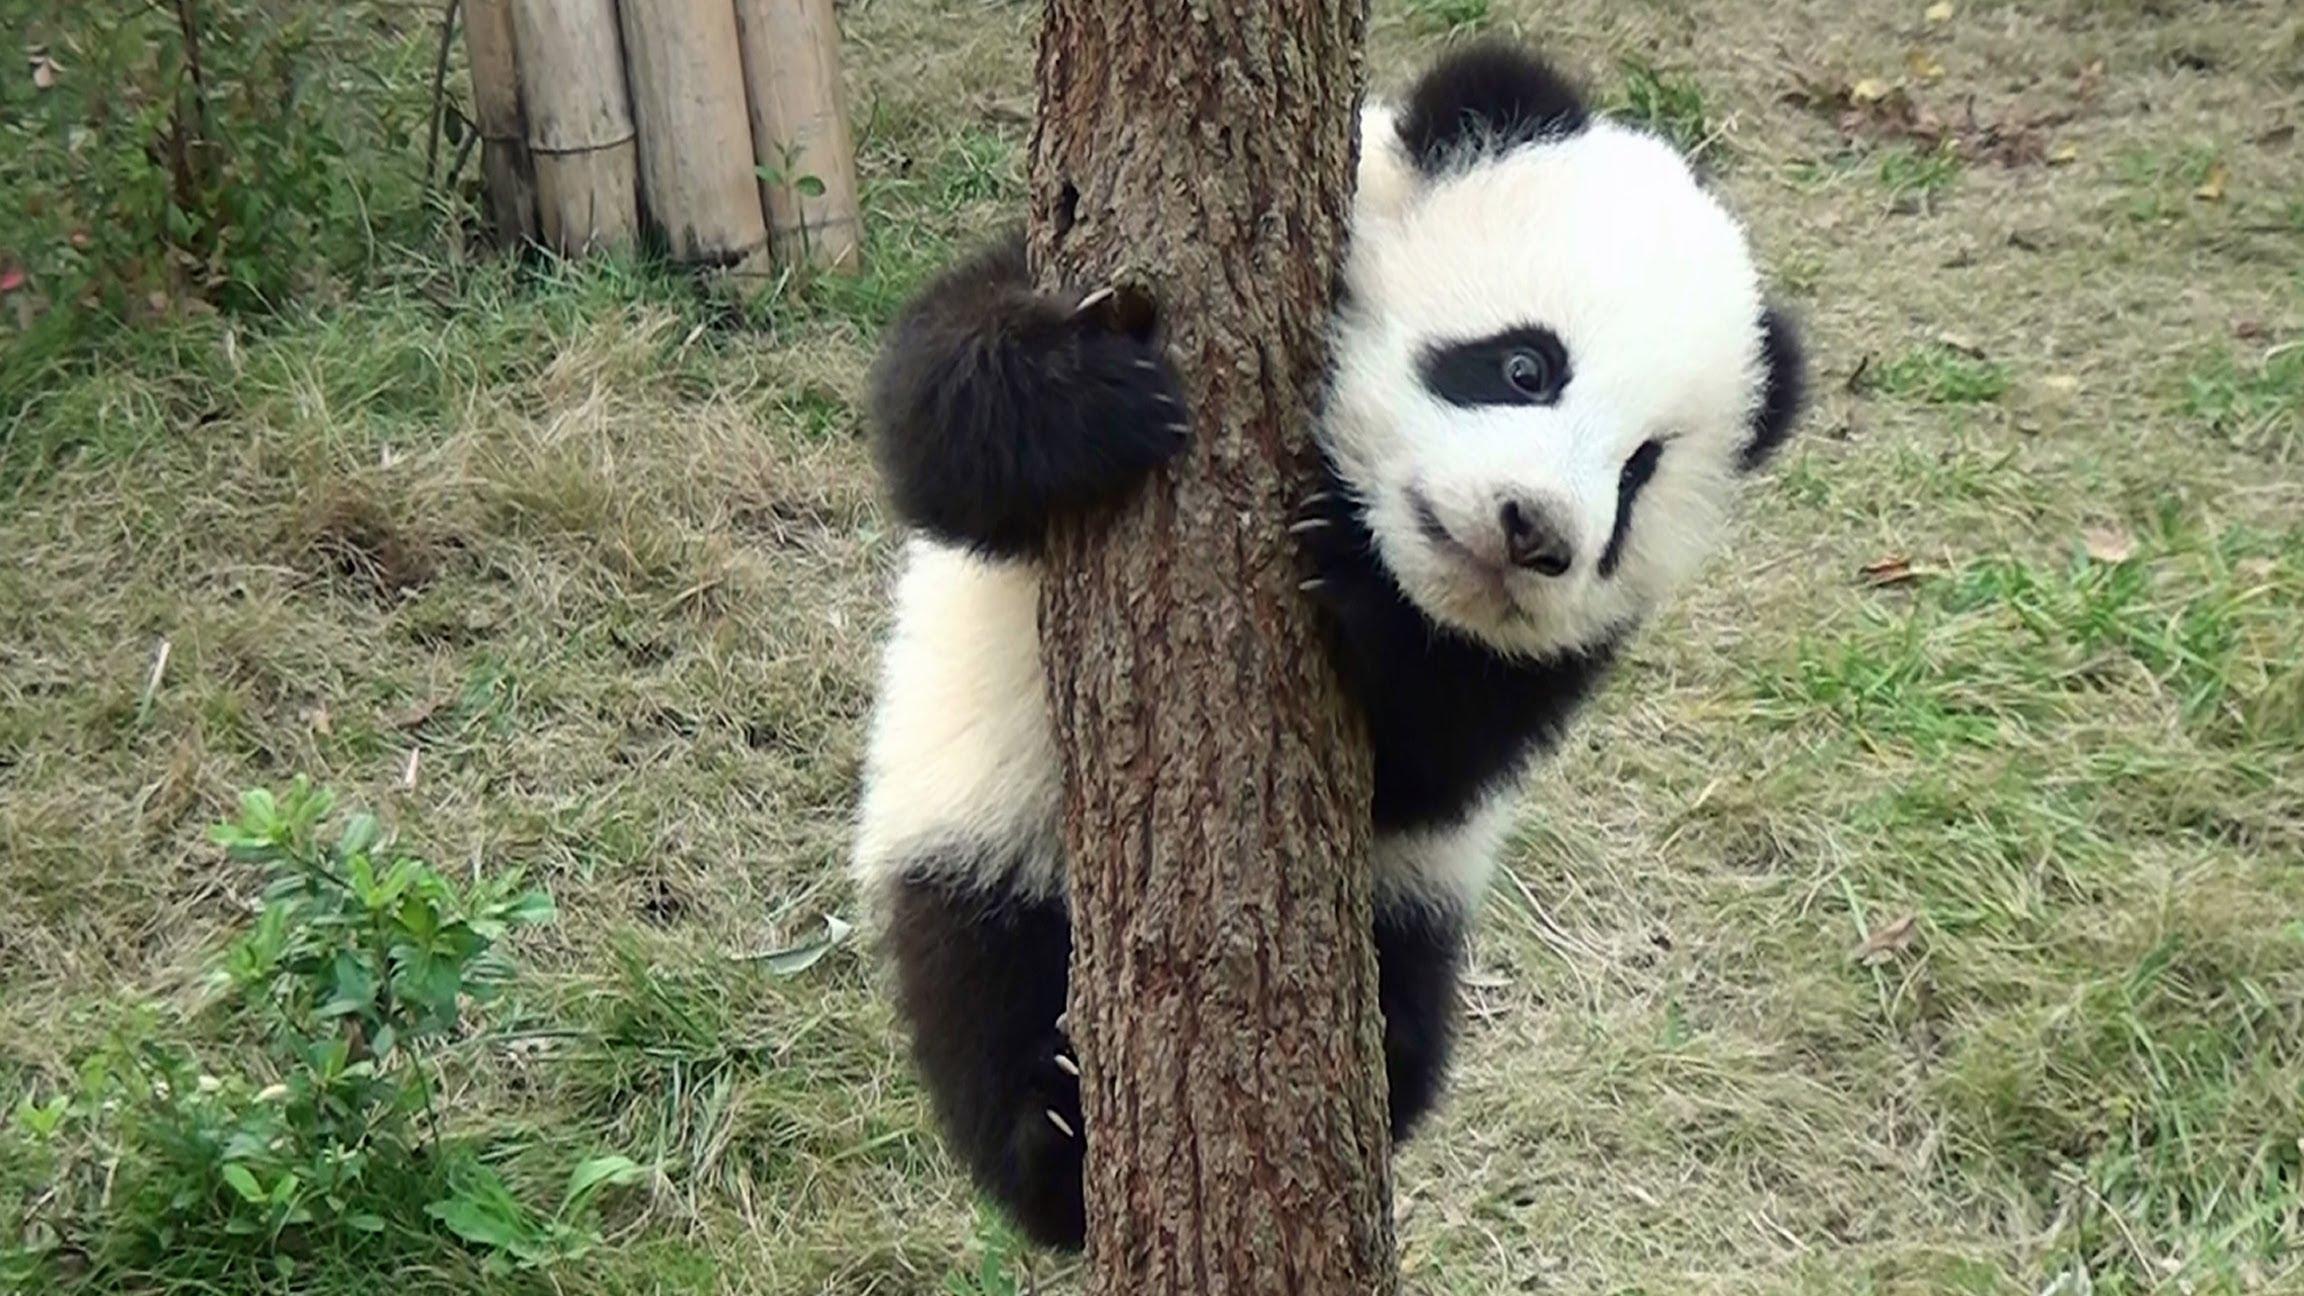 Baby Panda Wallpaper 2304x1296